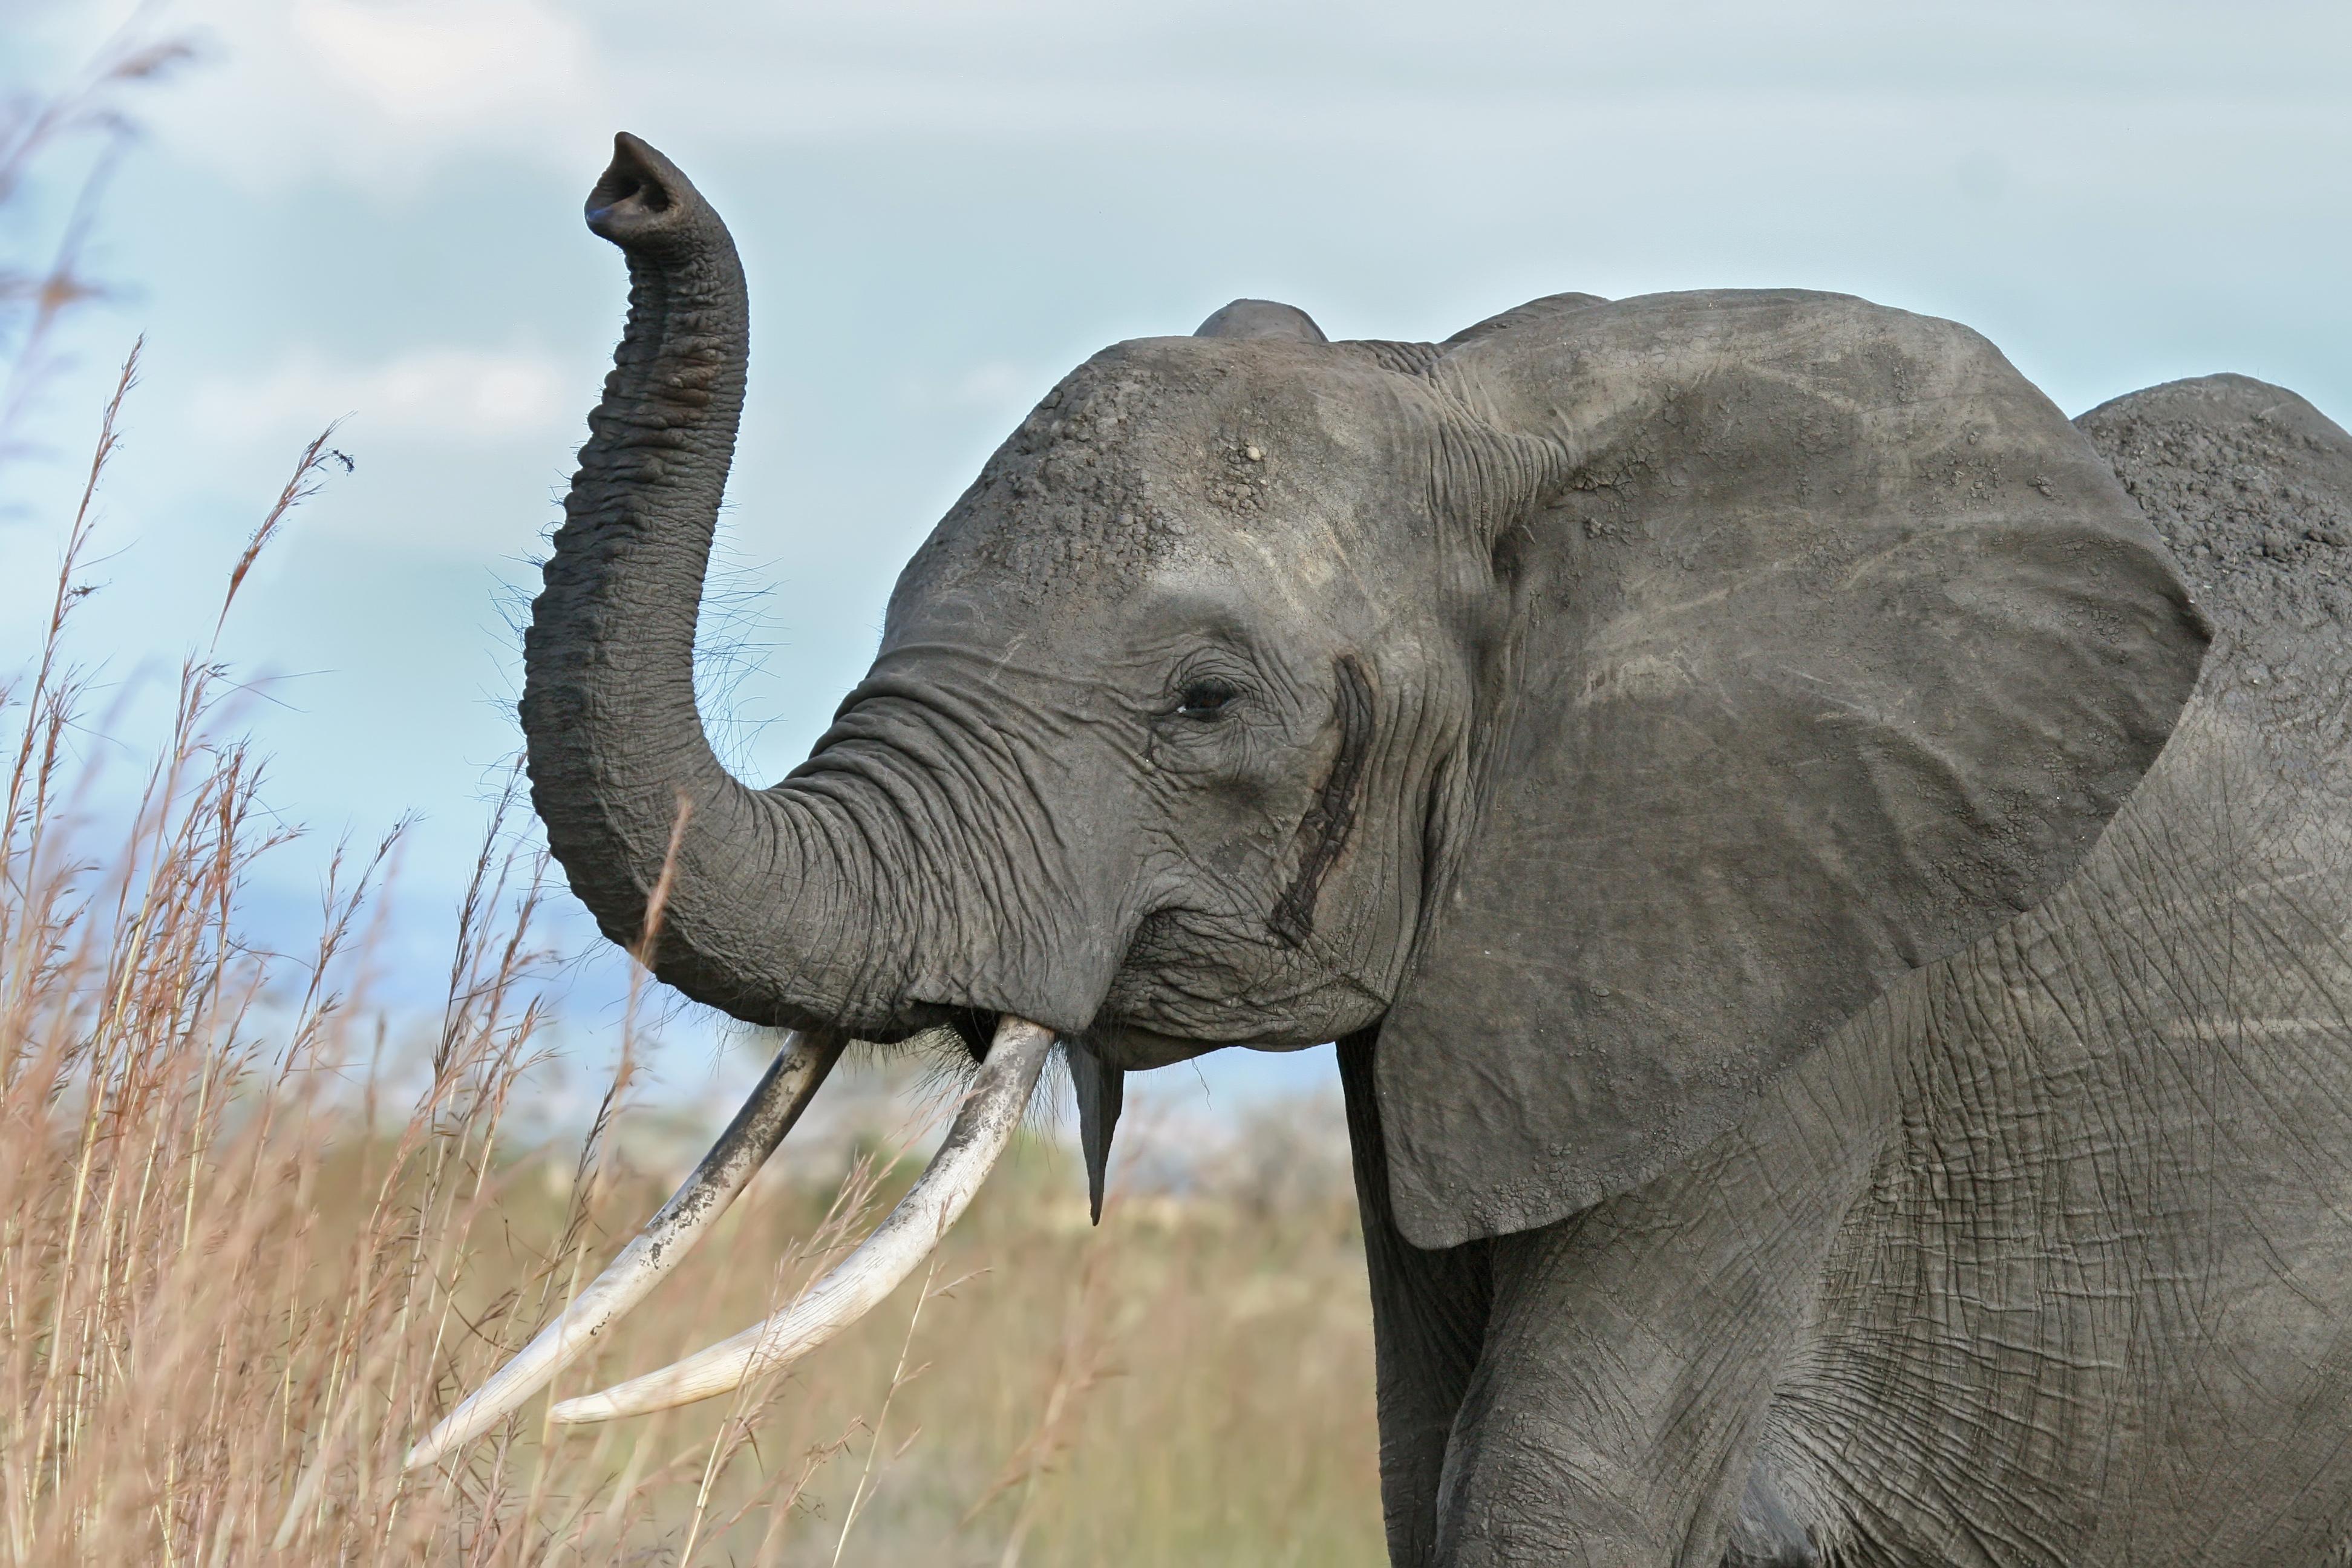 Elephant - Wikipedia